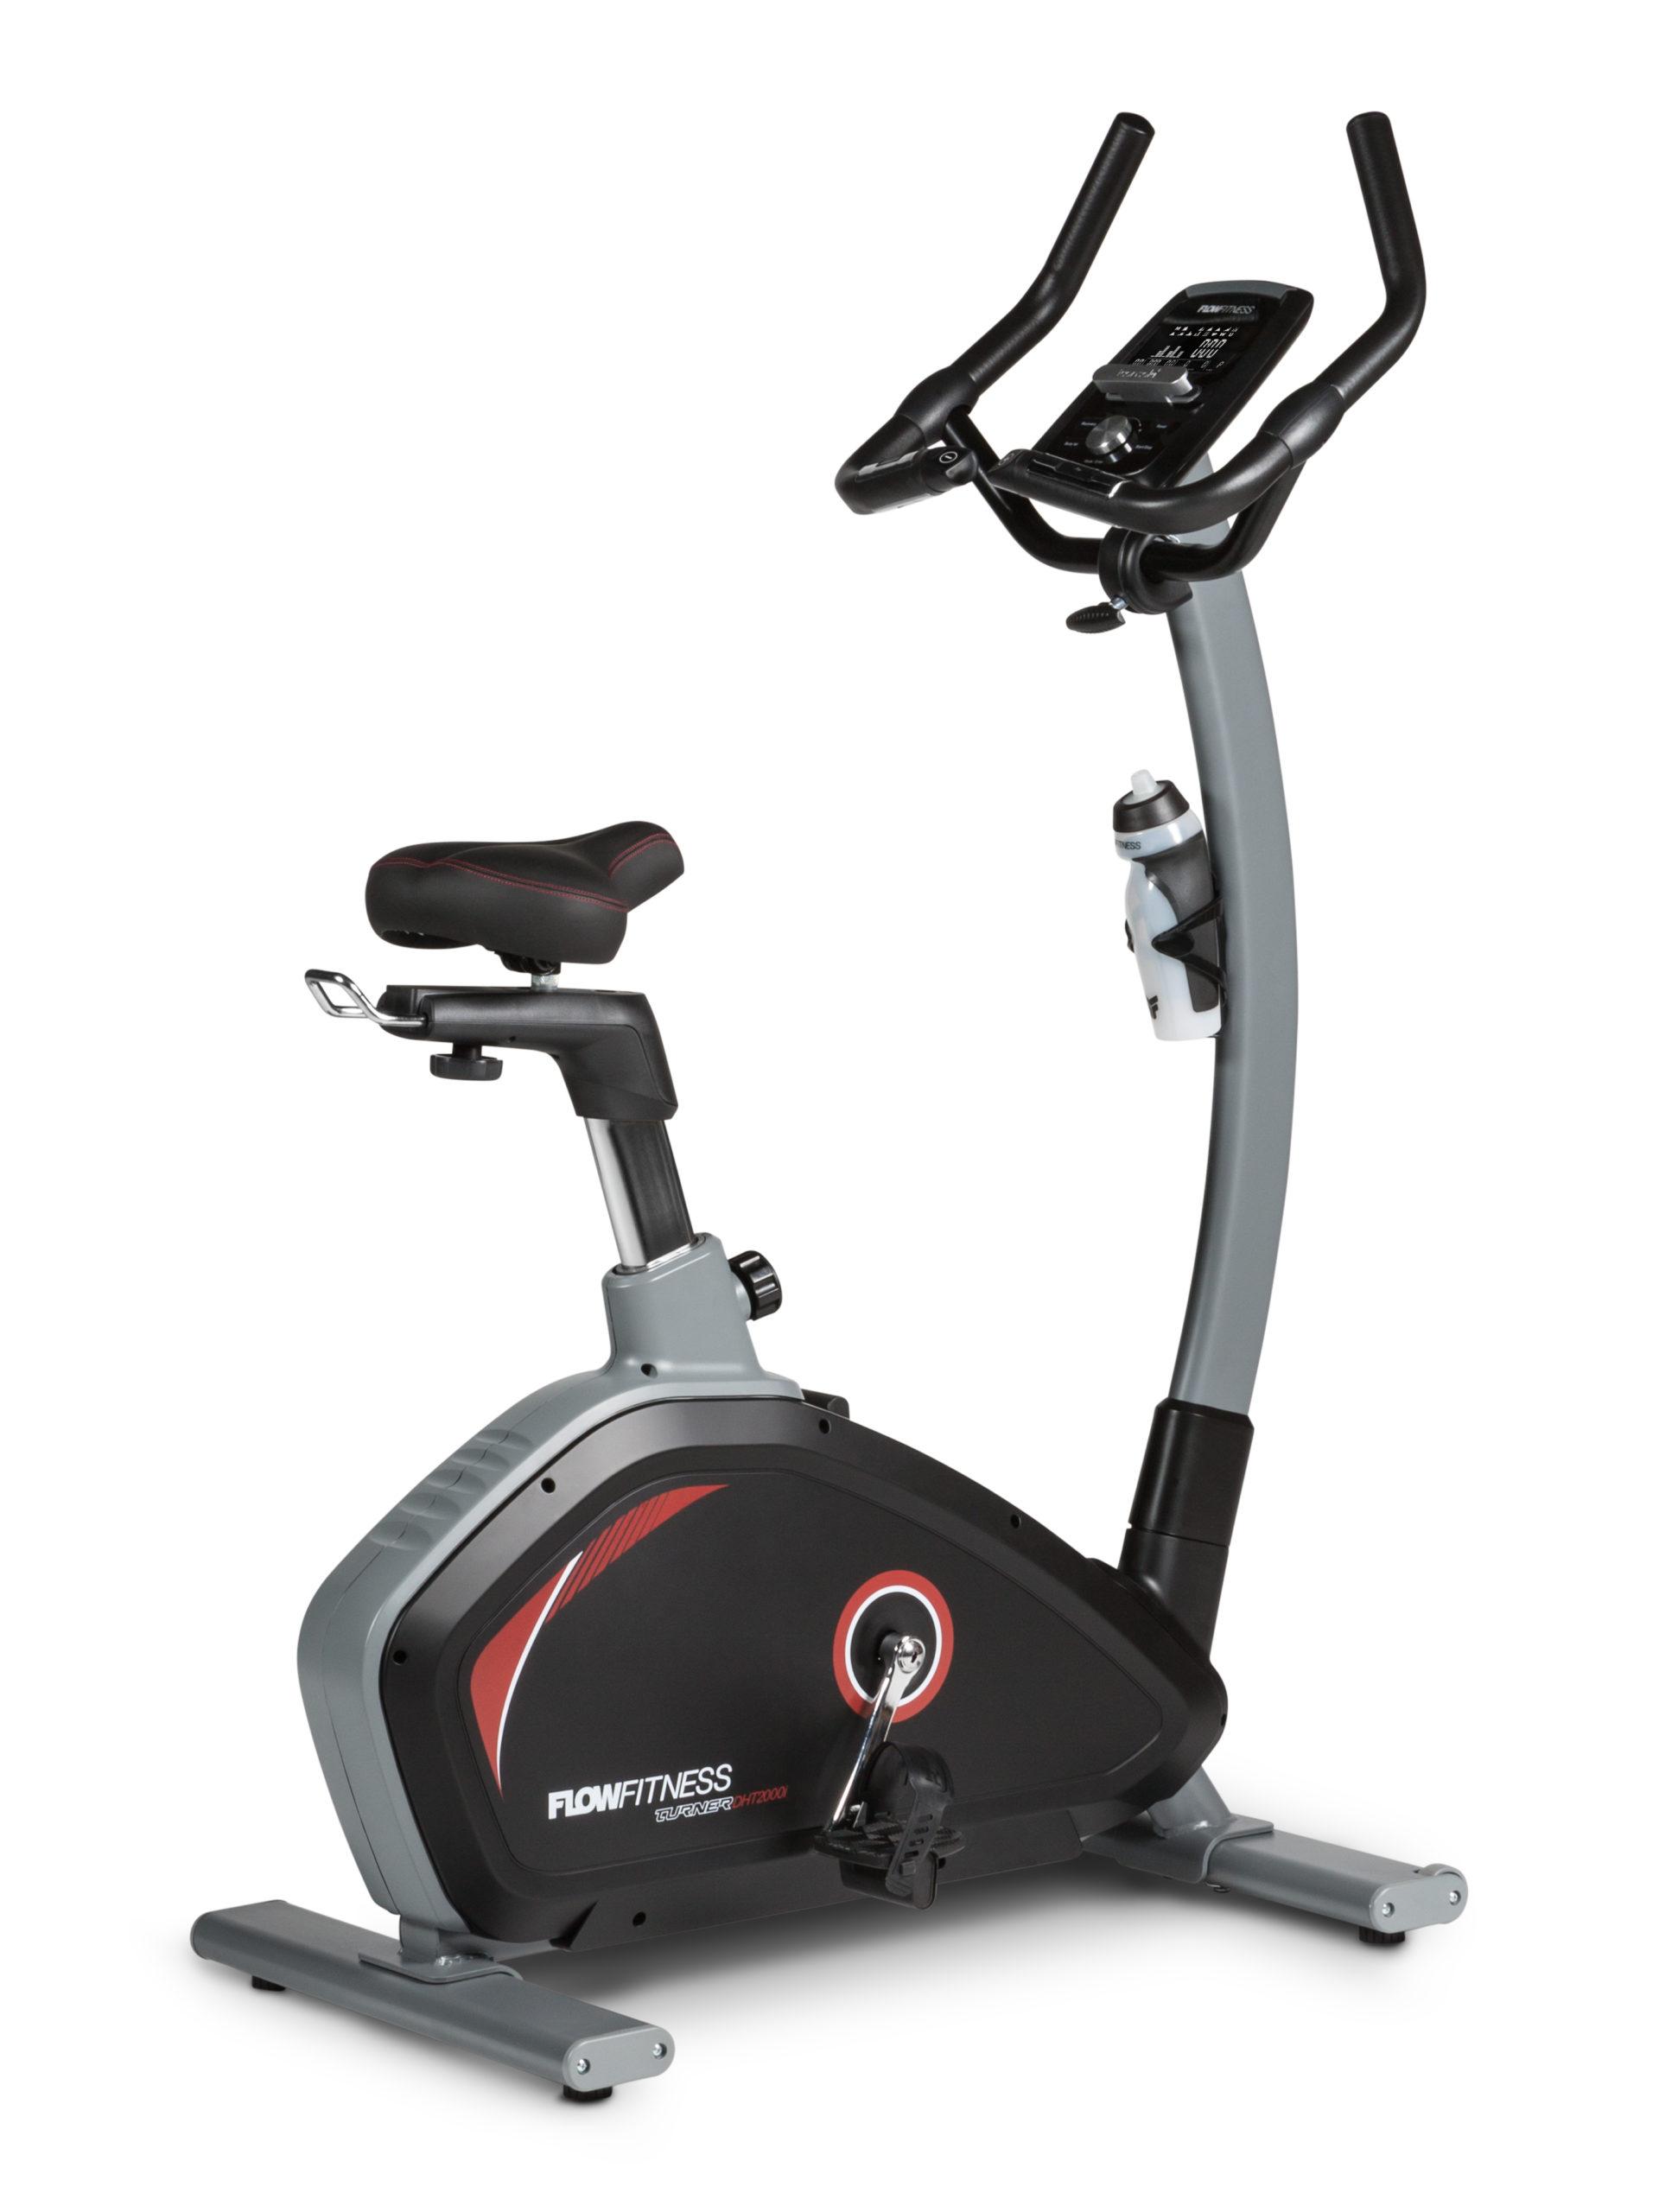 Flow Fitness Tabel Turner DHT2000i Hometrainer 13